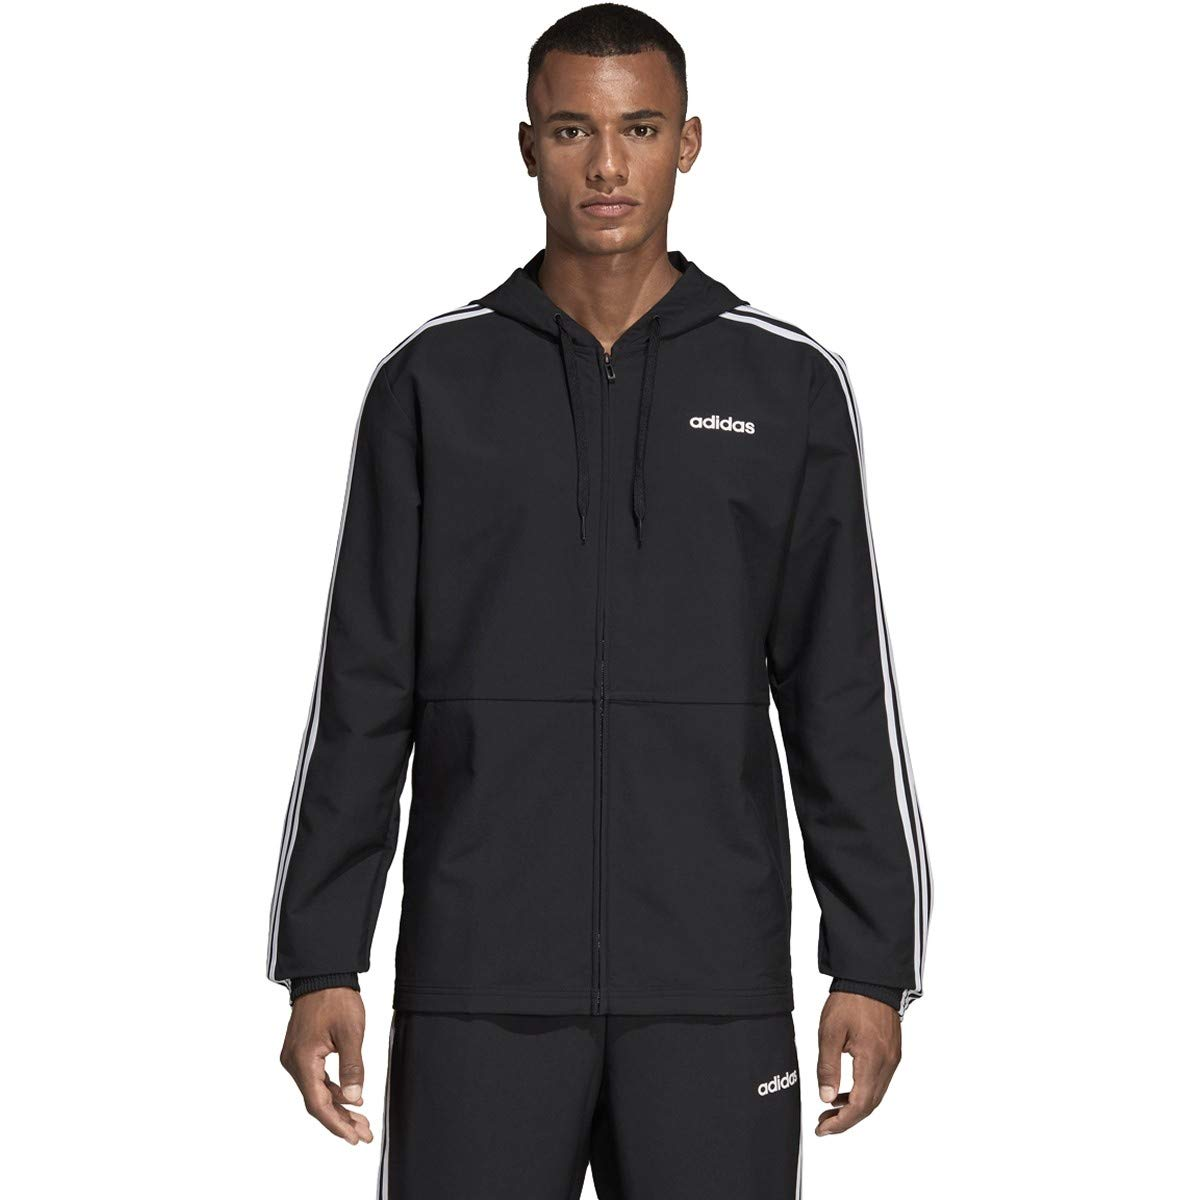 adidas Essentials Men's 3-Stripes Windbreaker, Black/White, 4XLT by adidas